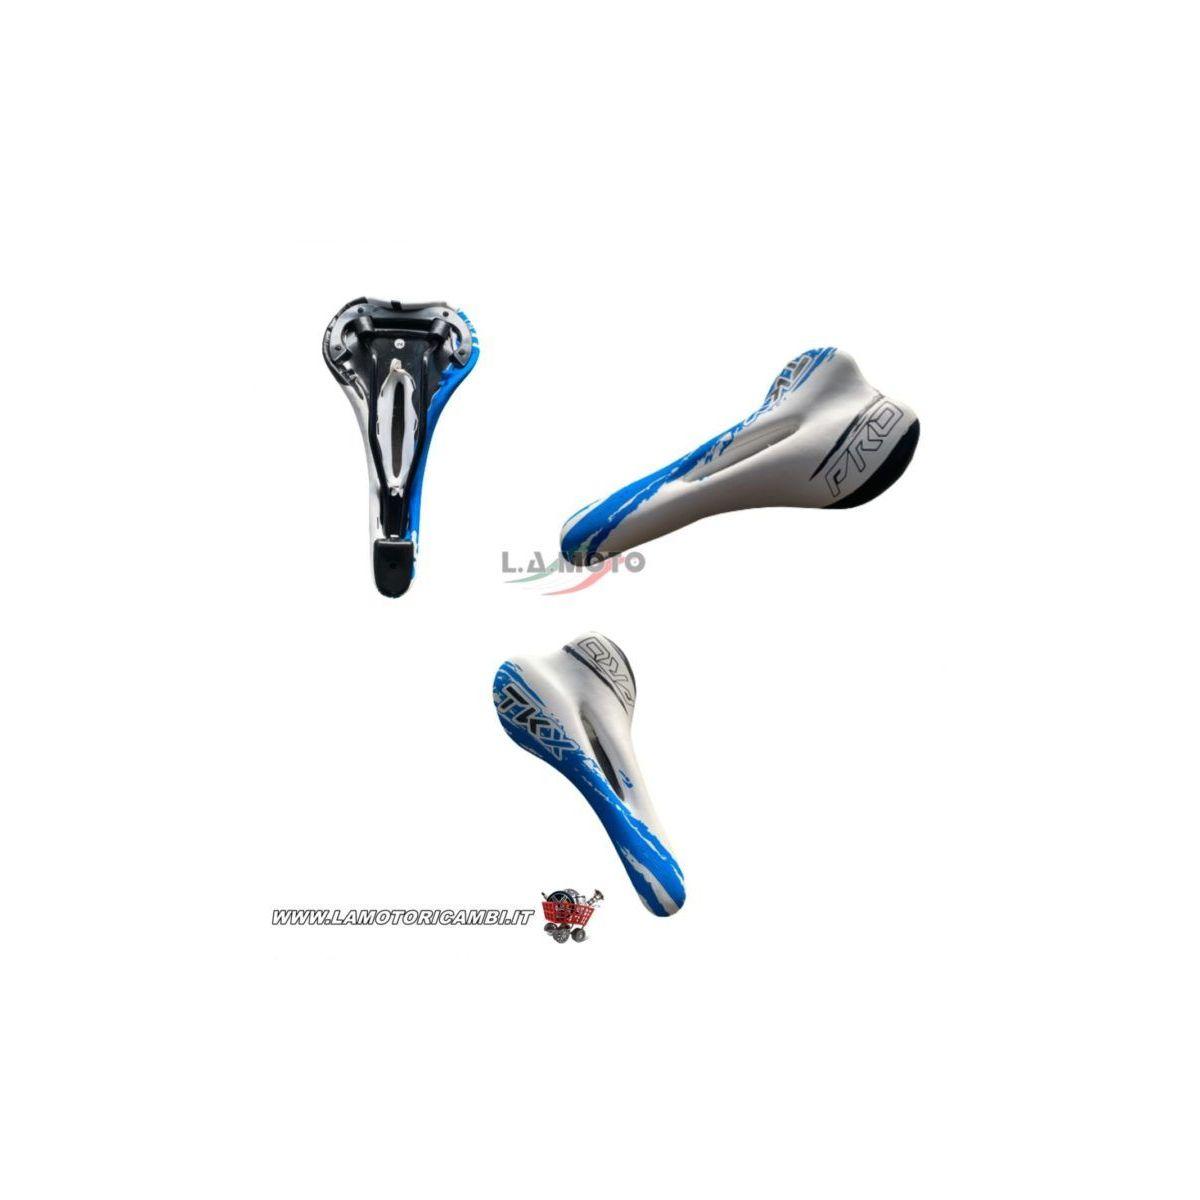 Sella Bici MTB – Mountain Bike – City Bike – E Bike Bianco / Blu / Nero TKX PRO